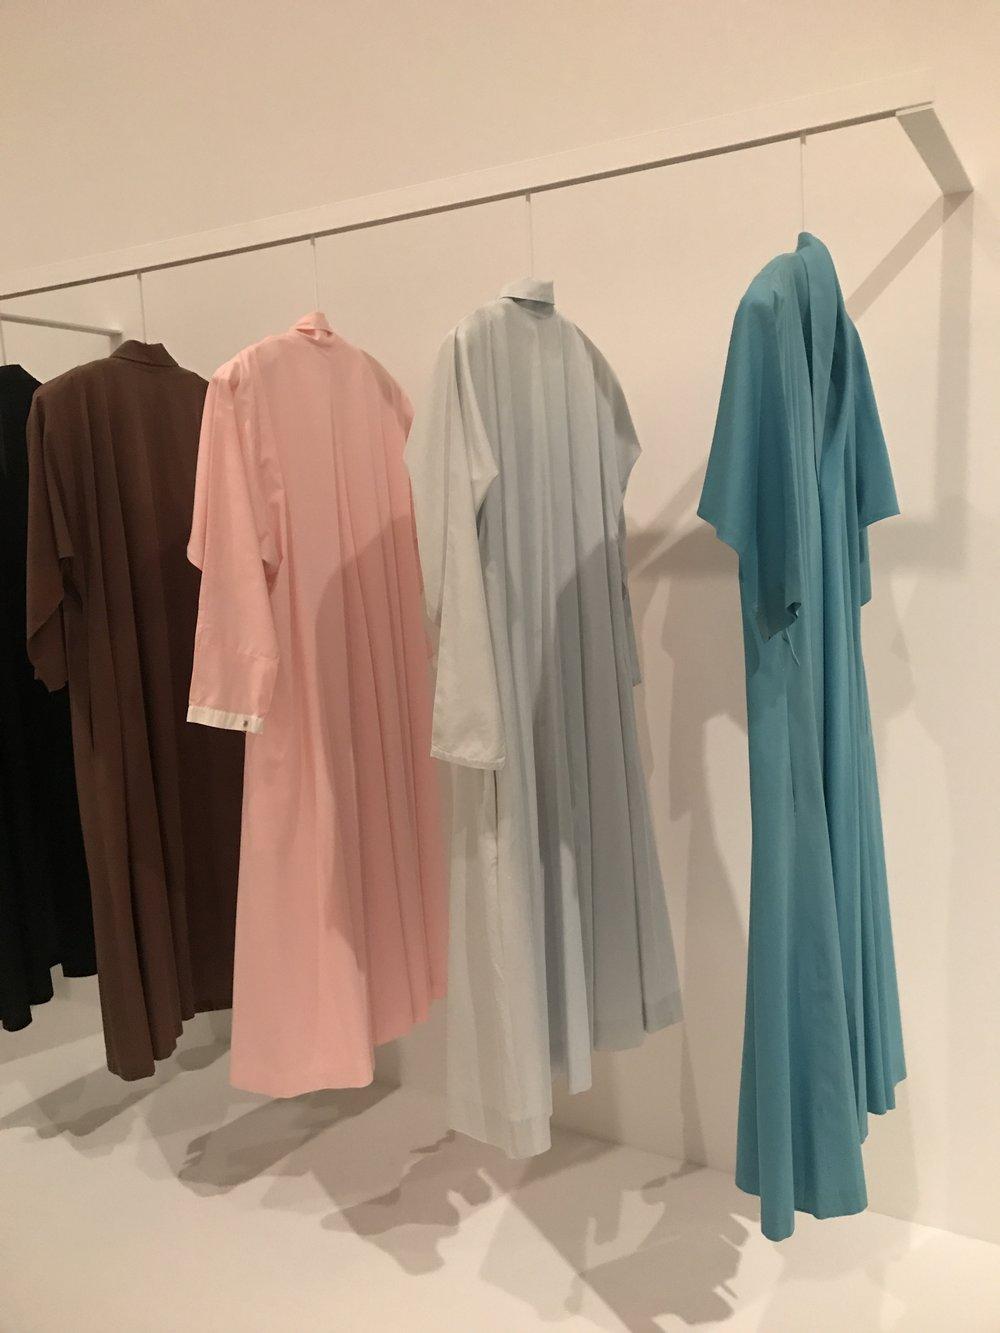 O'Keeffe's wrap dresses from Georgia O'Keeffe: Living Modern, Brooklyn Museum.